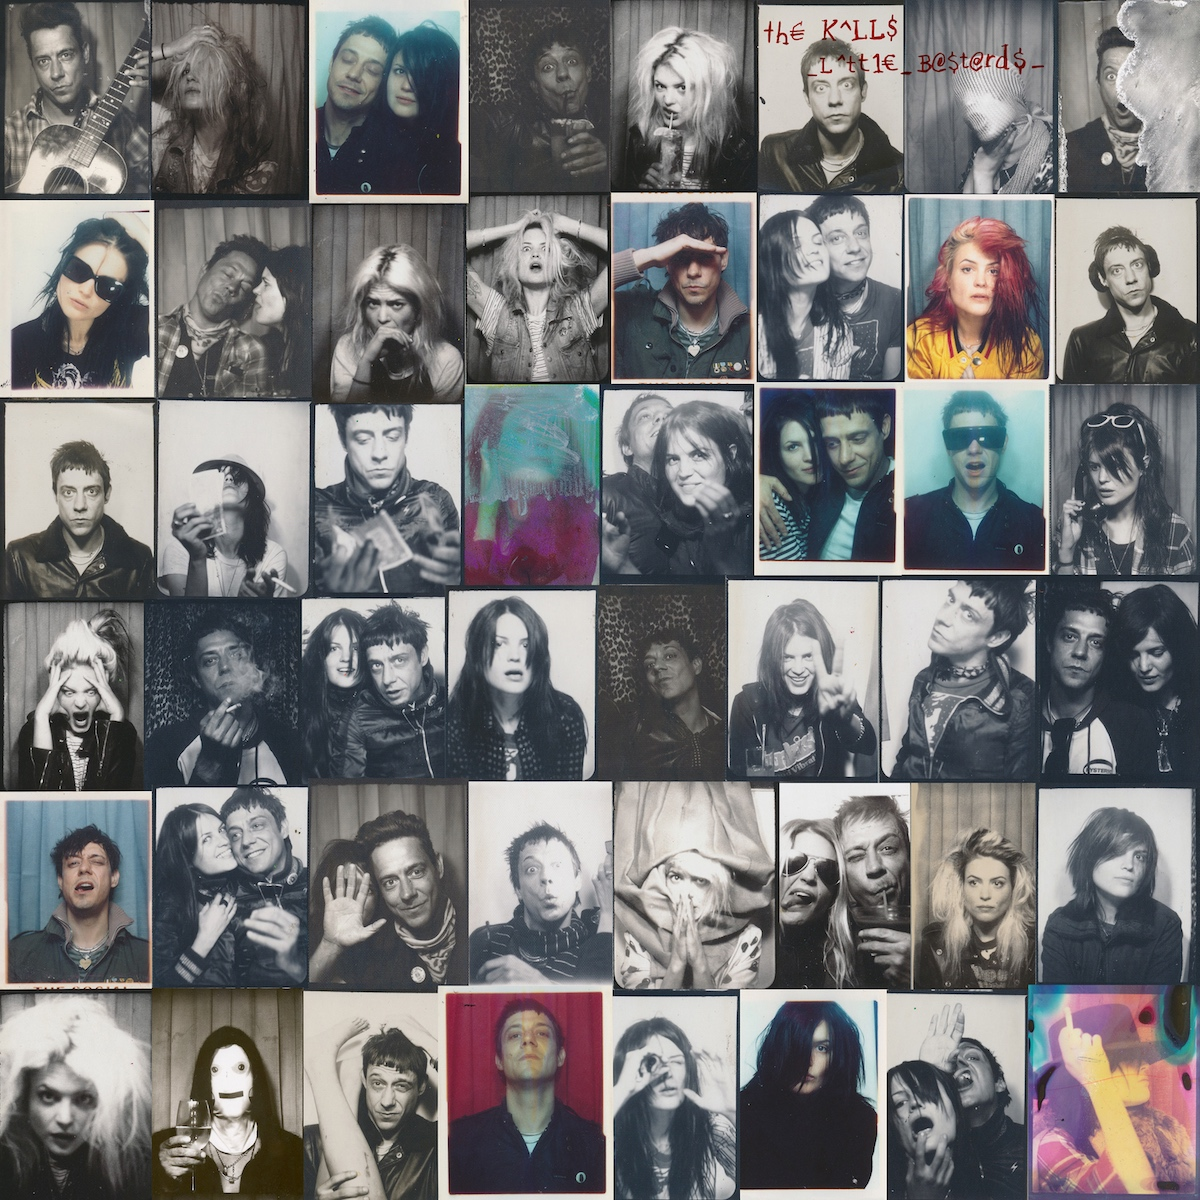 The Kills little bastards rarities album artwork raise me